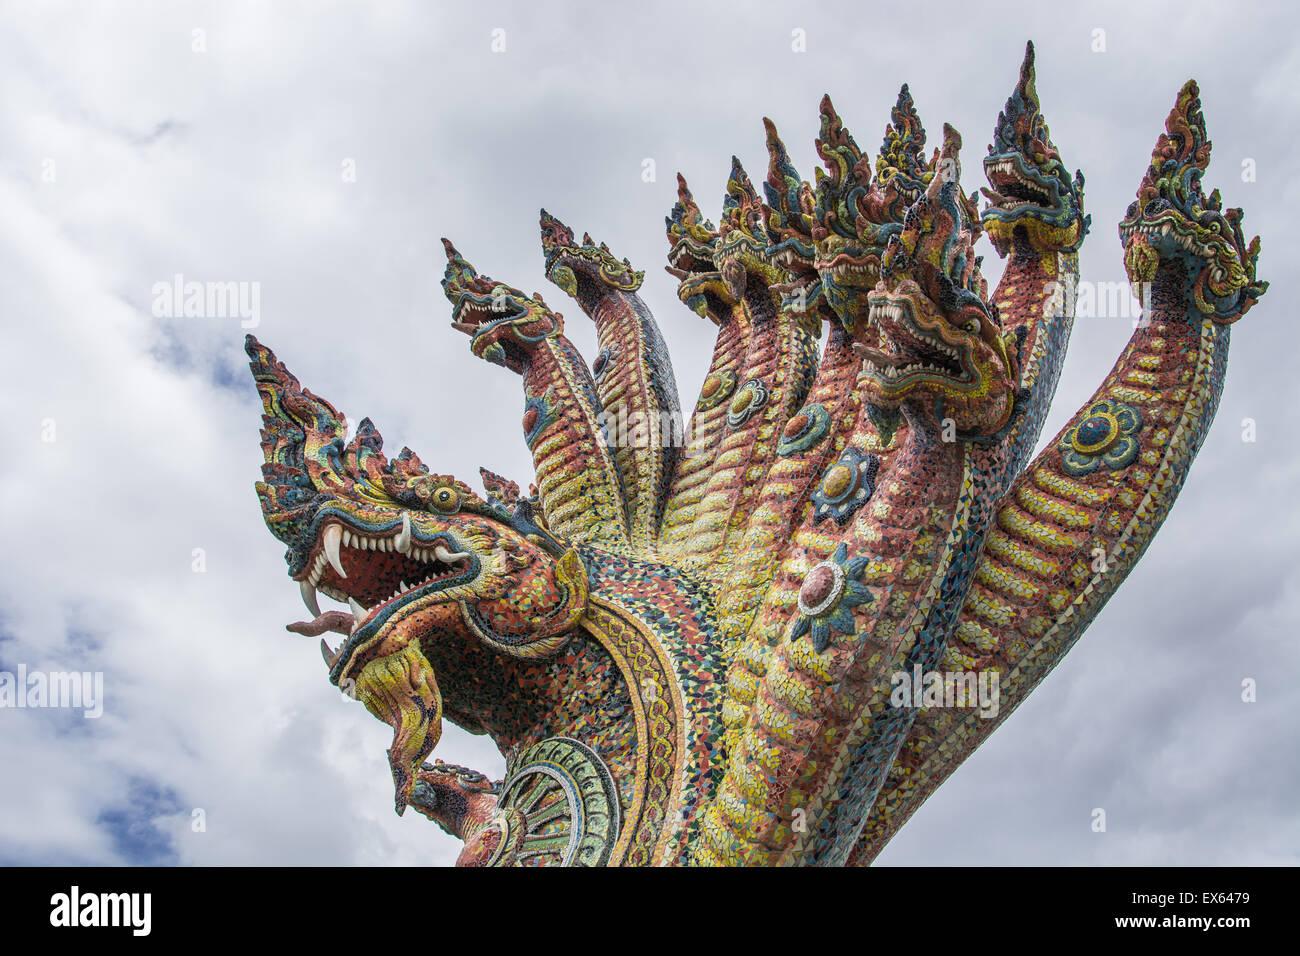 Temple of Ban Rai, Province Nakhonratchasima, Thailand - Stock Image